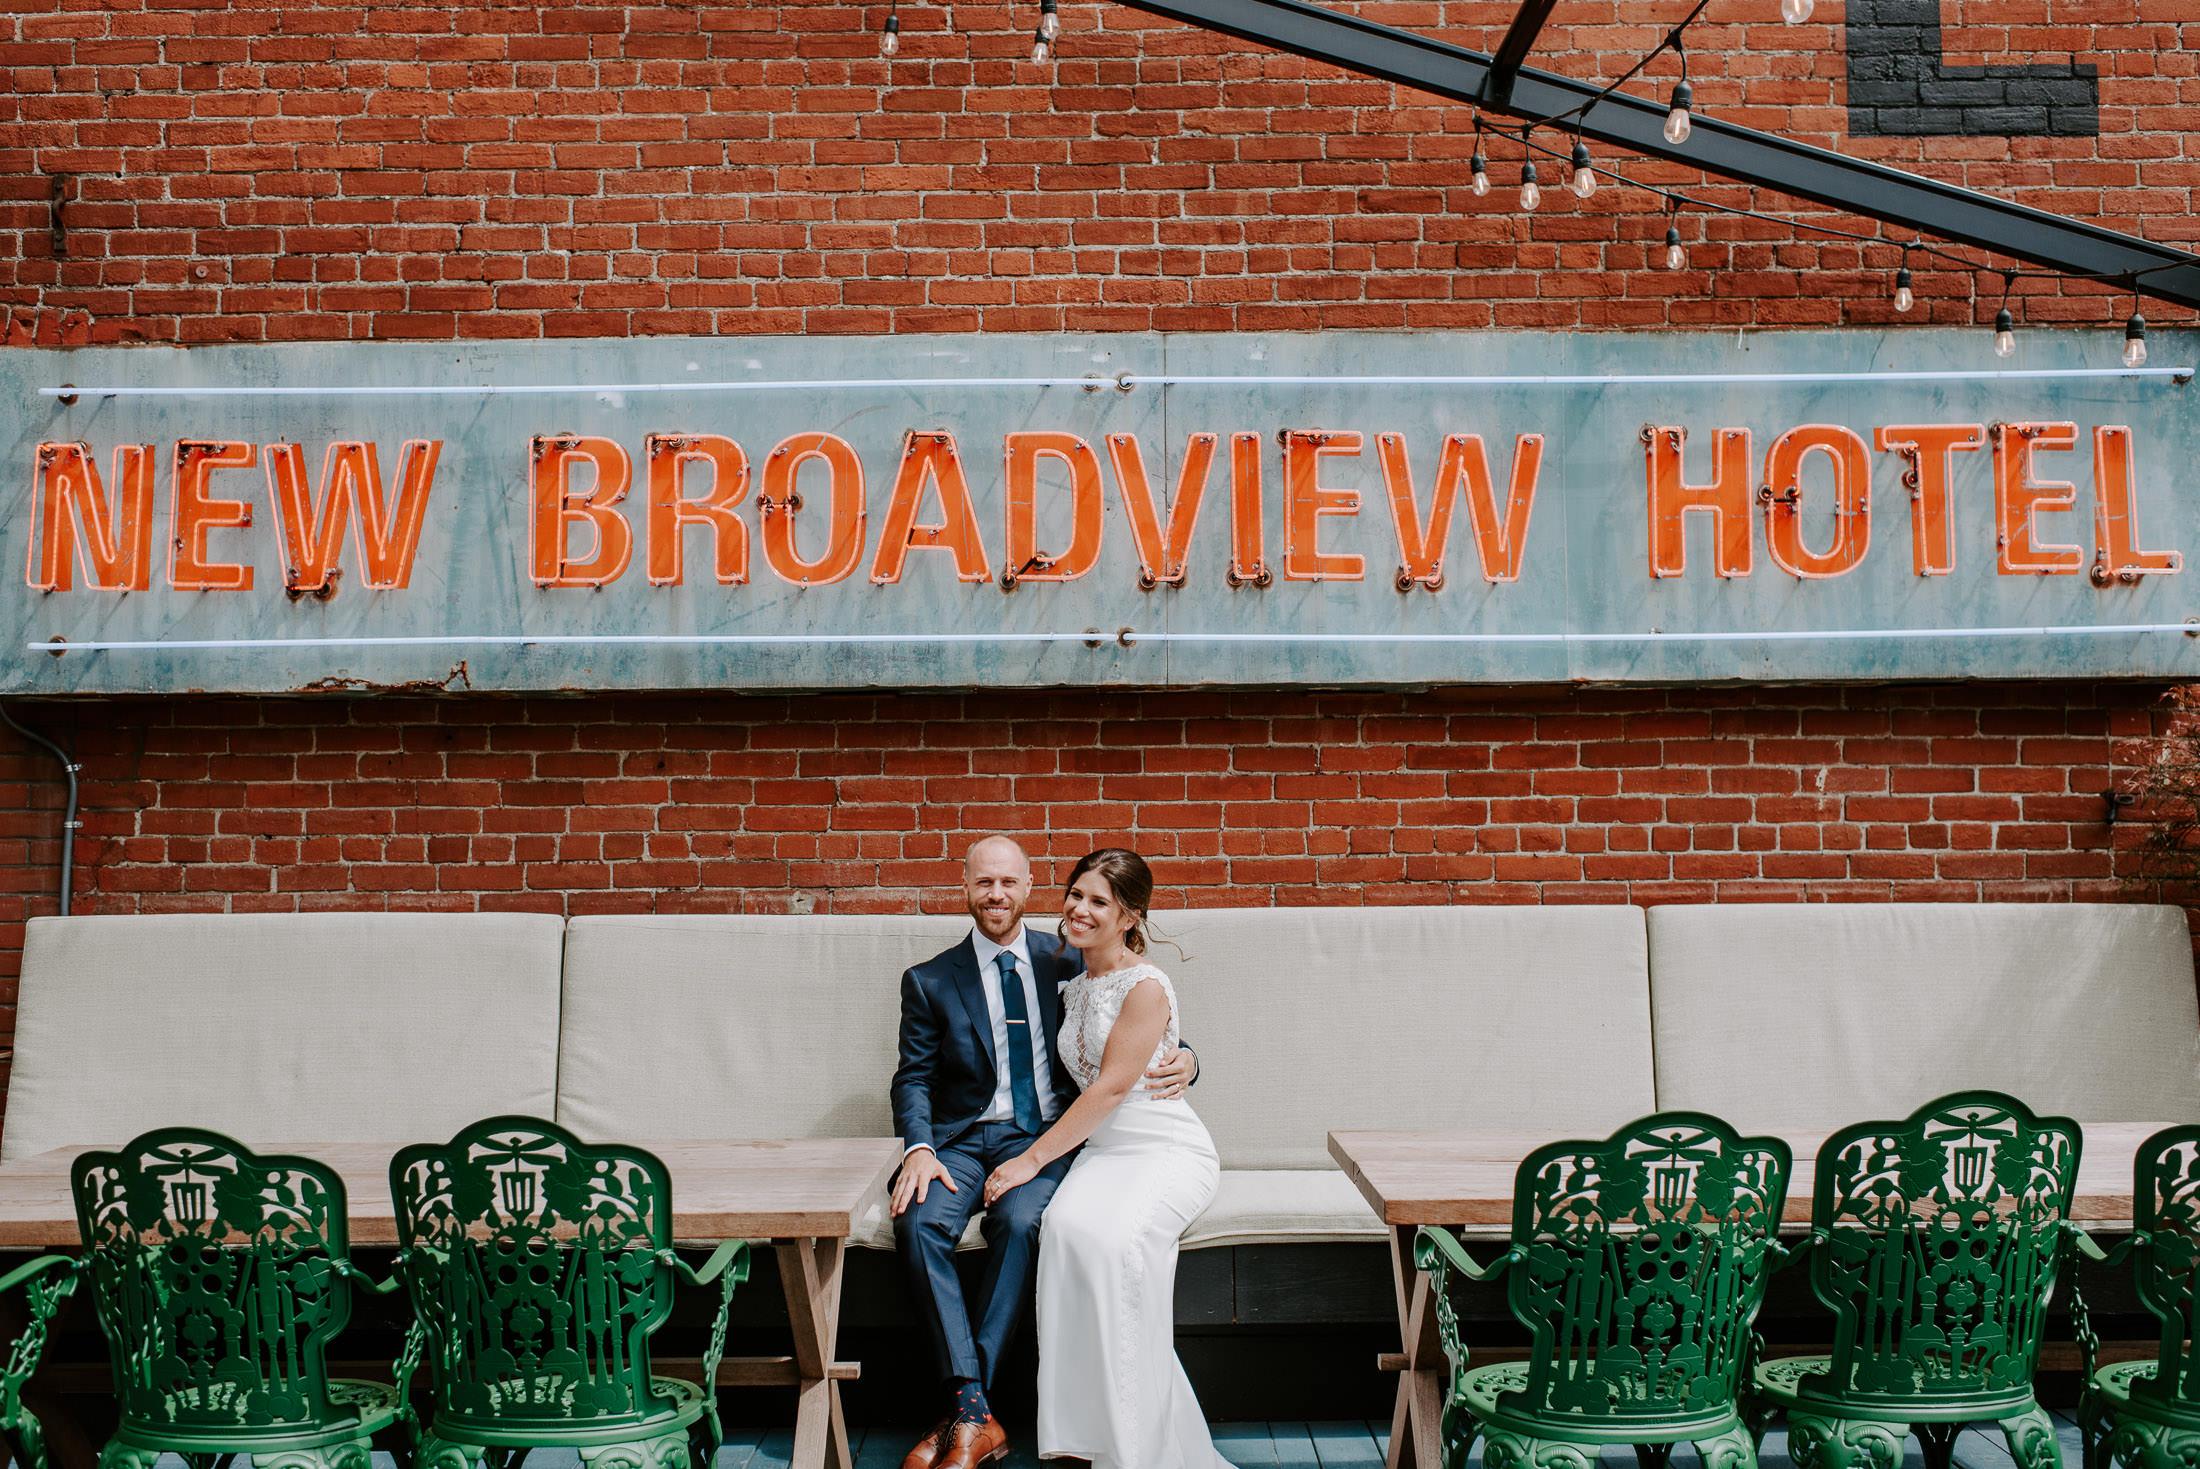 New Broadview Hotel Toronto Wedding Couple